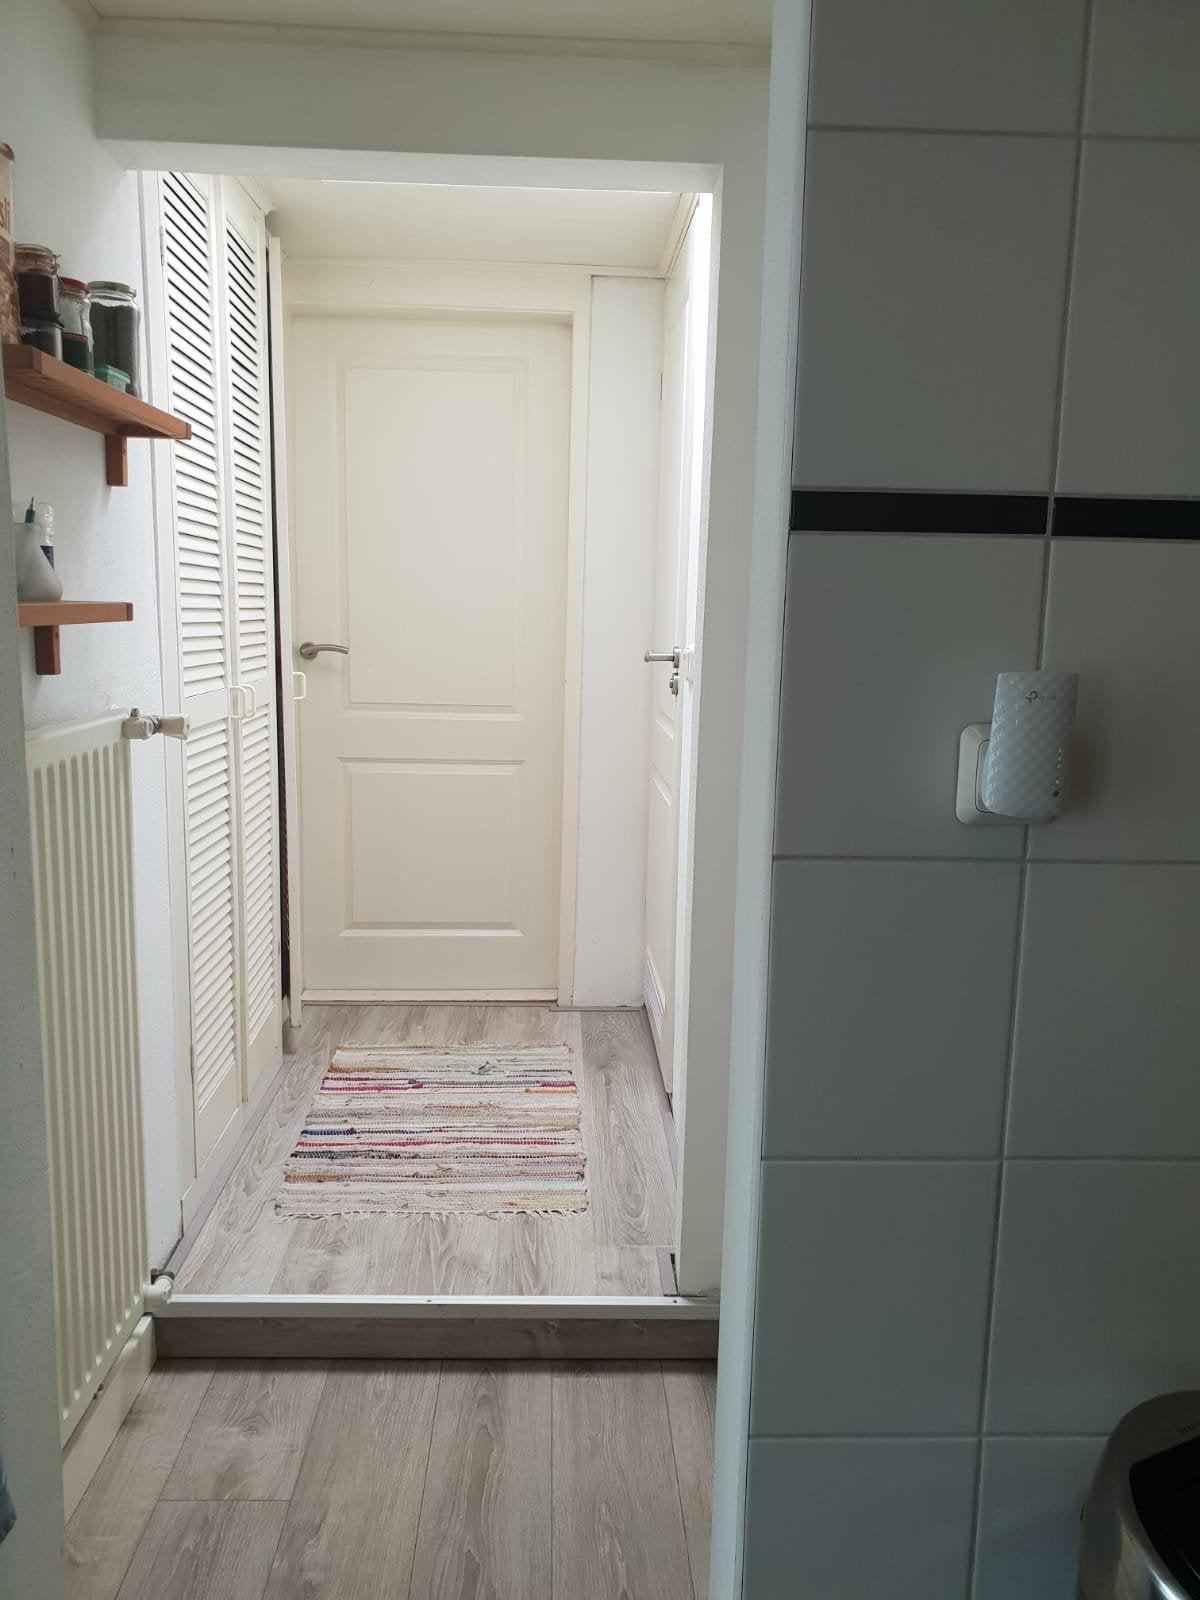 https://public.parariusoffice.nl/293/photos/huge/51856959.1542113777-291.jpeg